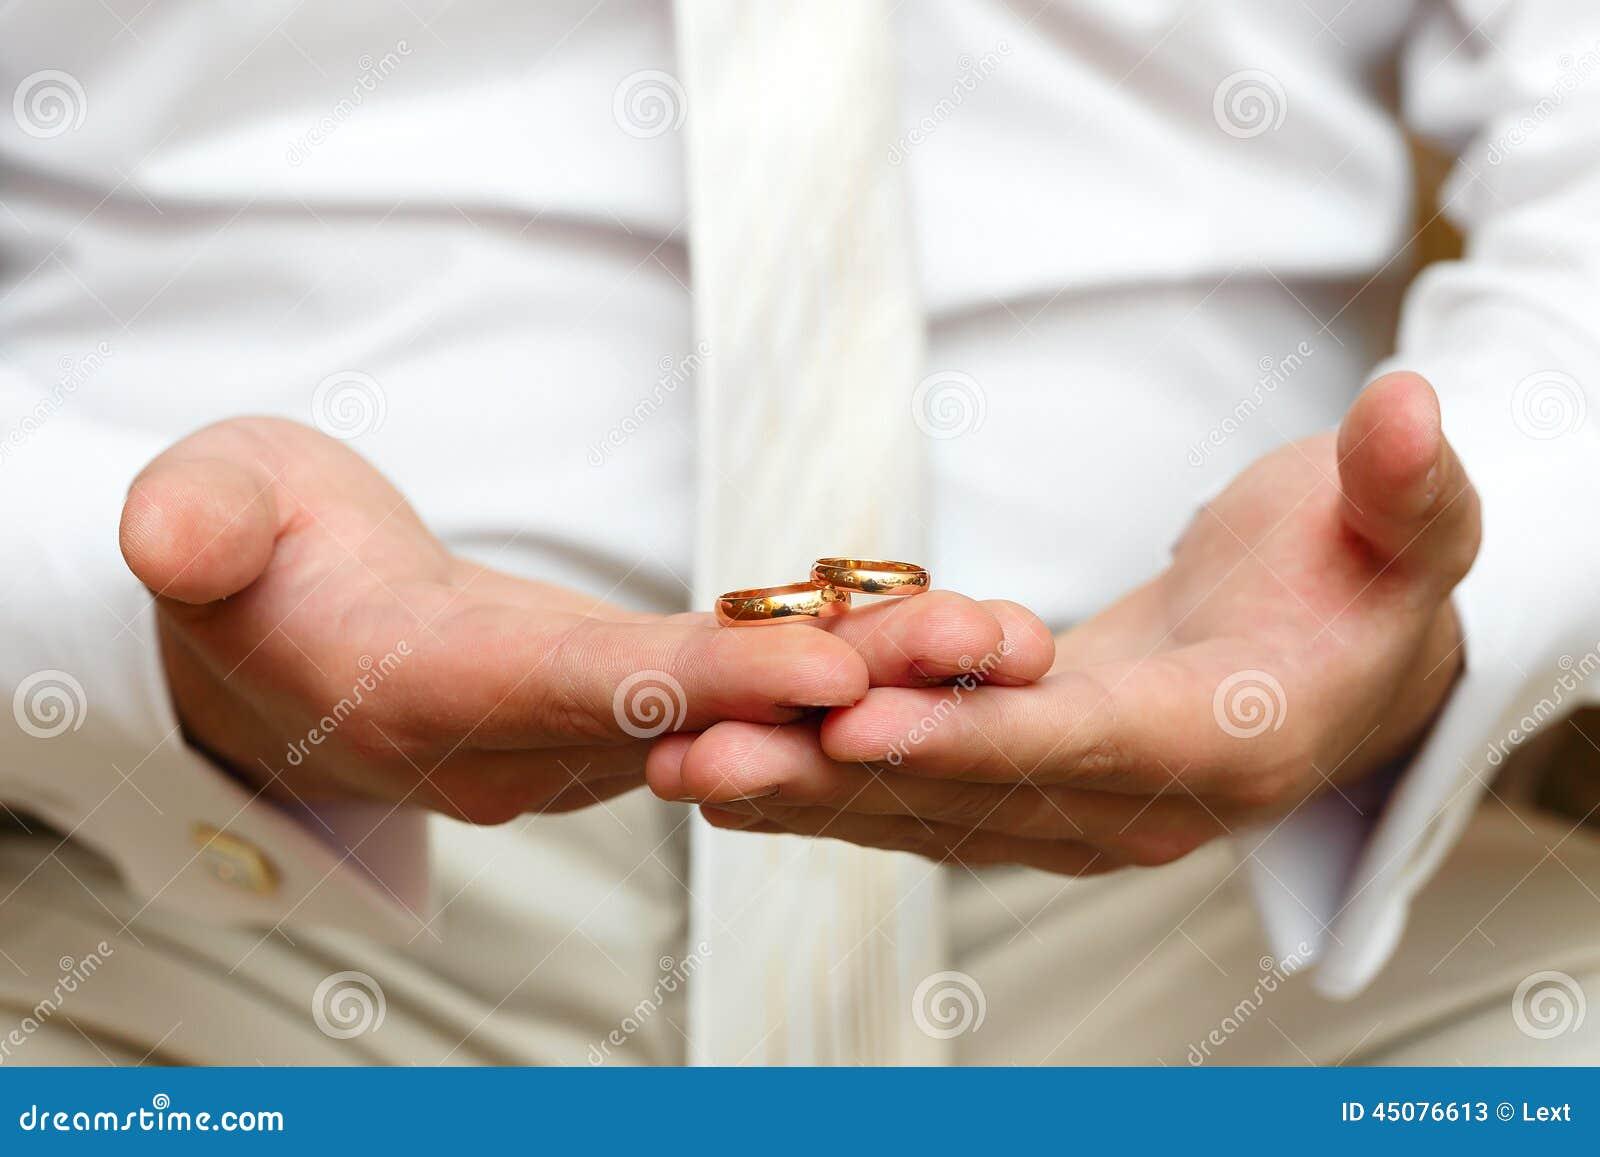 Very Best Gold Wedding Rings On Hand 1300 x 957 · 84 kB · jpeg